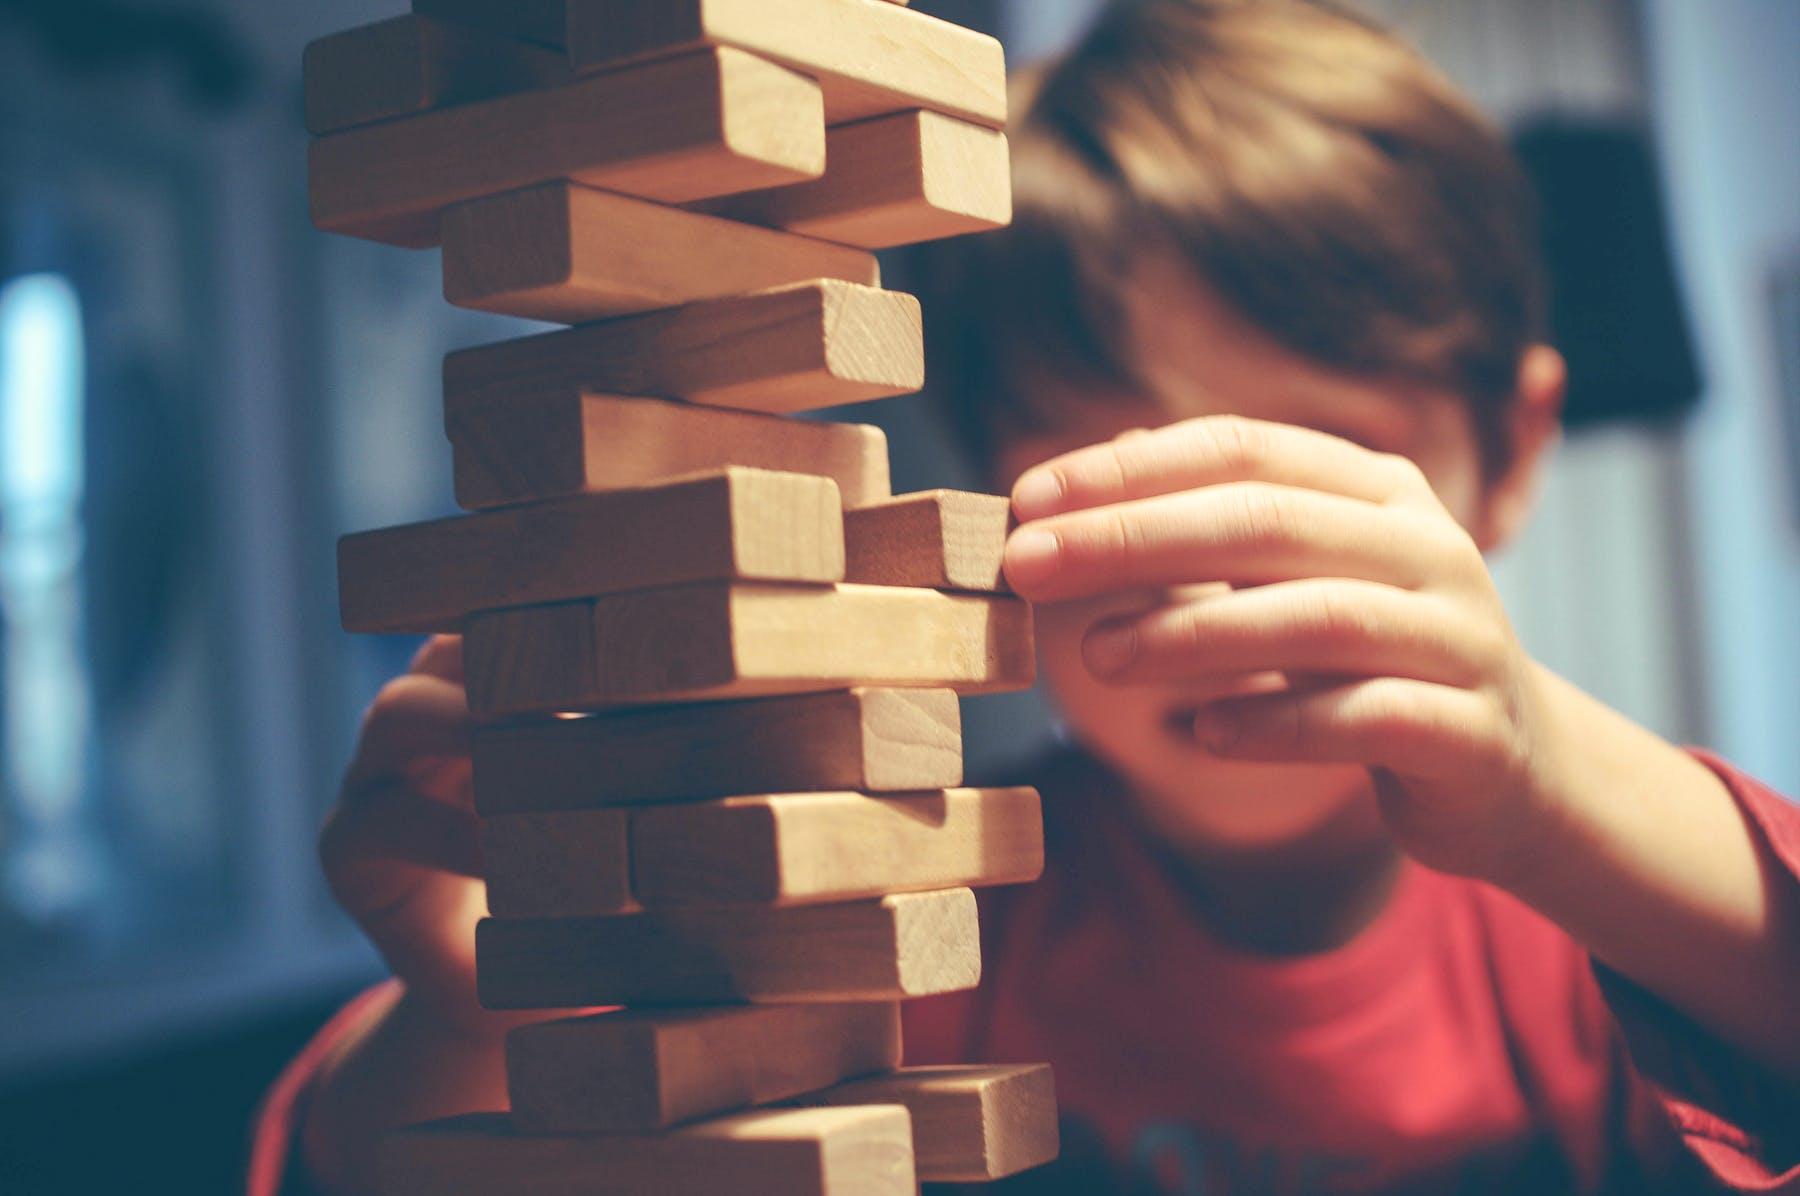 Junge baut Turm aus Holzbausteinen Jenga